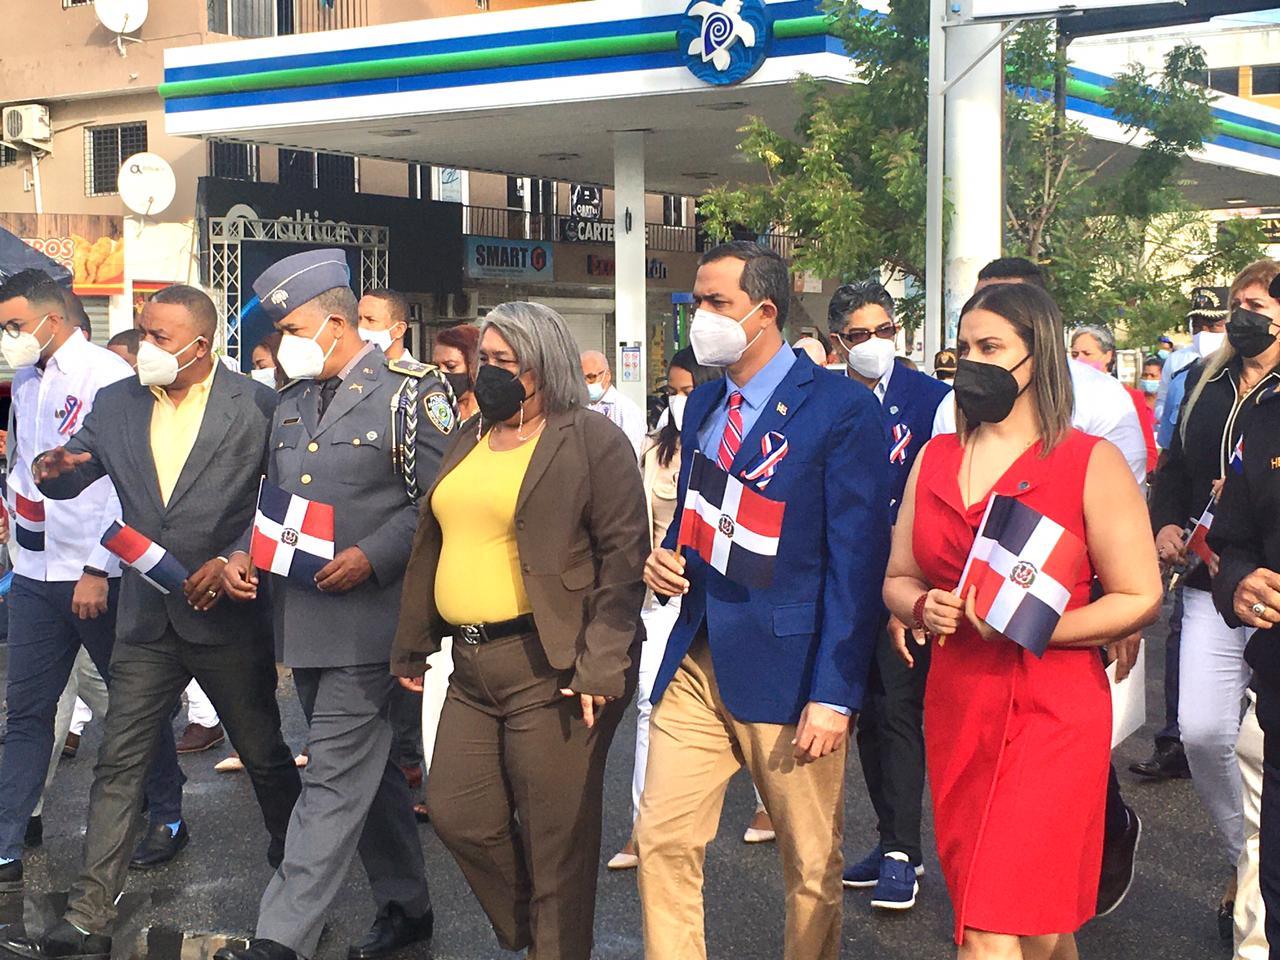 Alcaldía de Haina participa en actos conmemorativos por 177 aniversario de Independencia Nacional